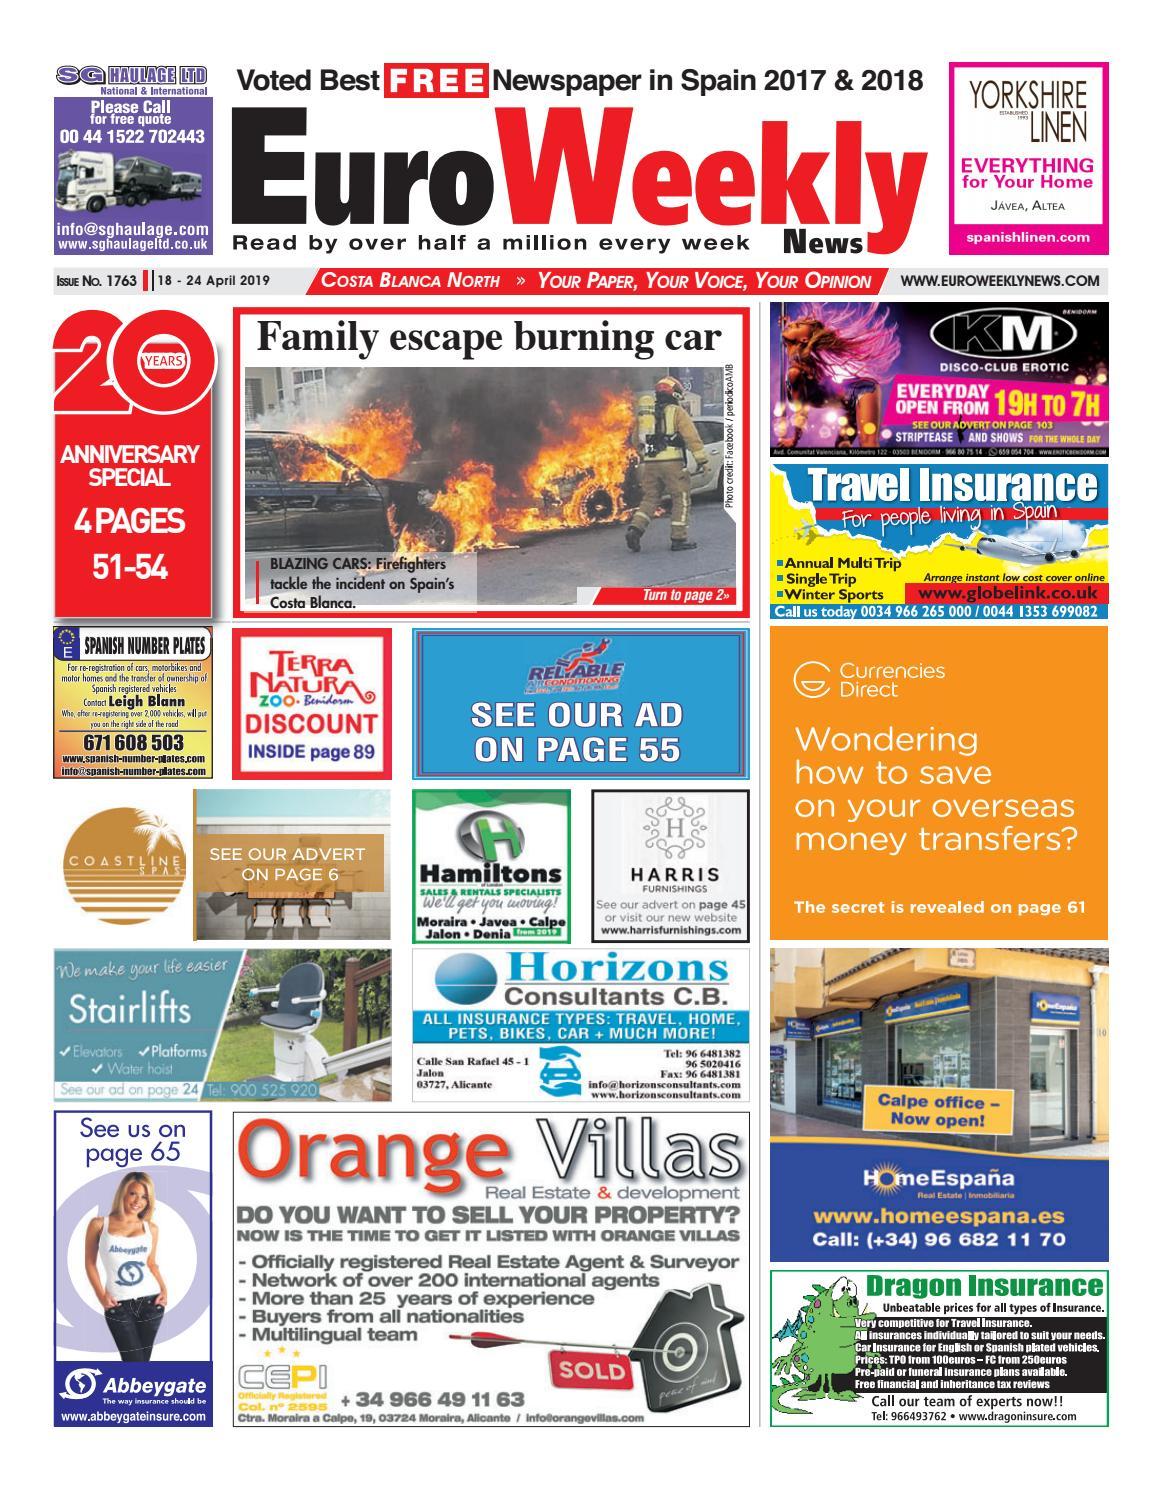 Euro Weekly News - Costa Blanca North 18 - 24 April 2019